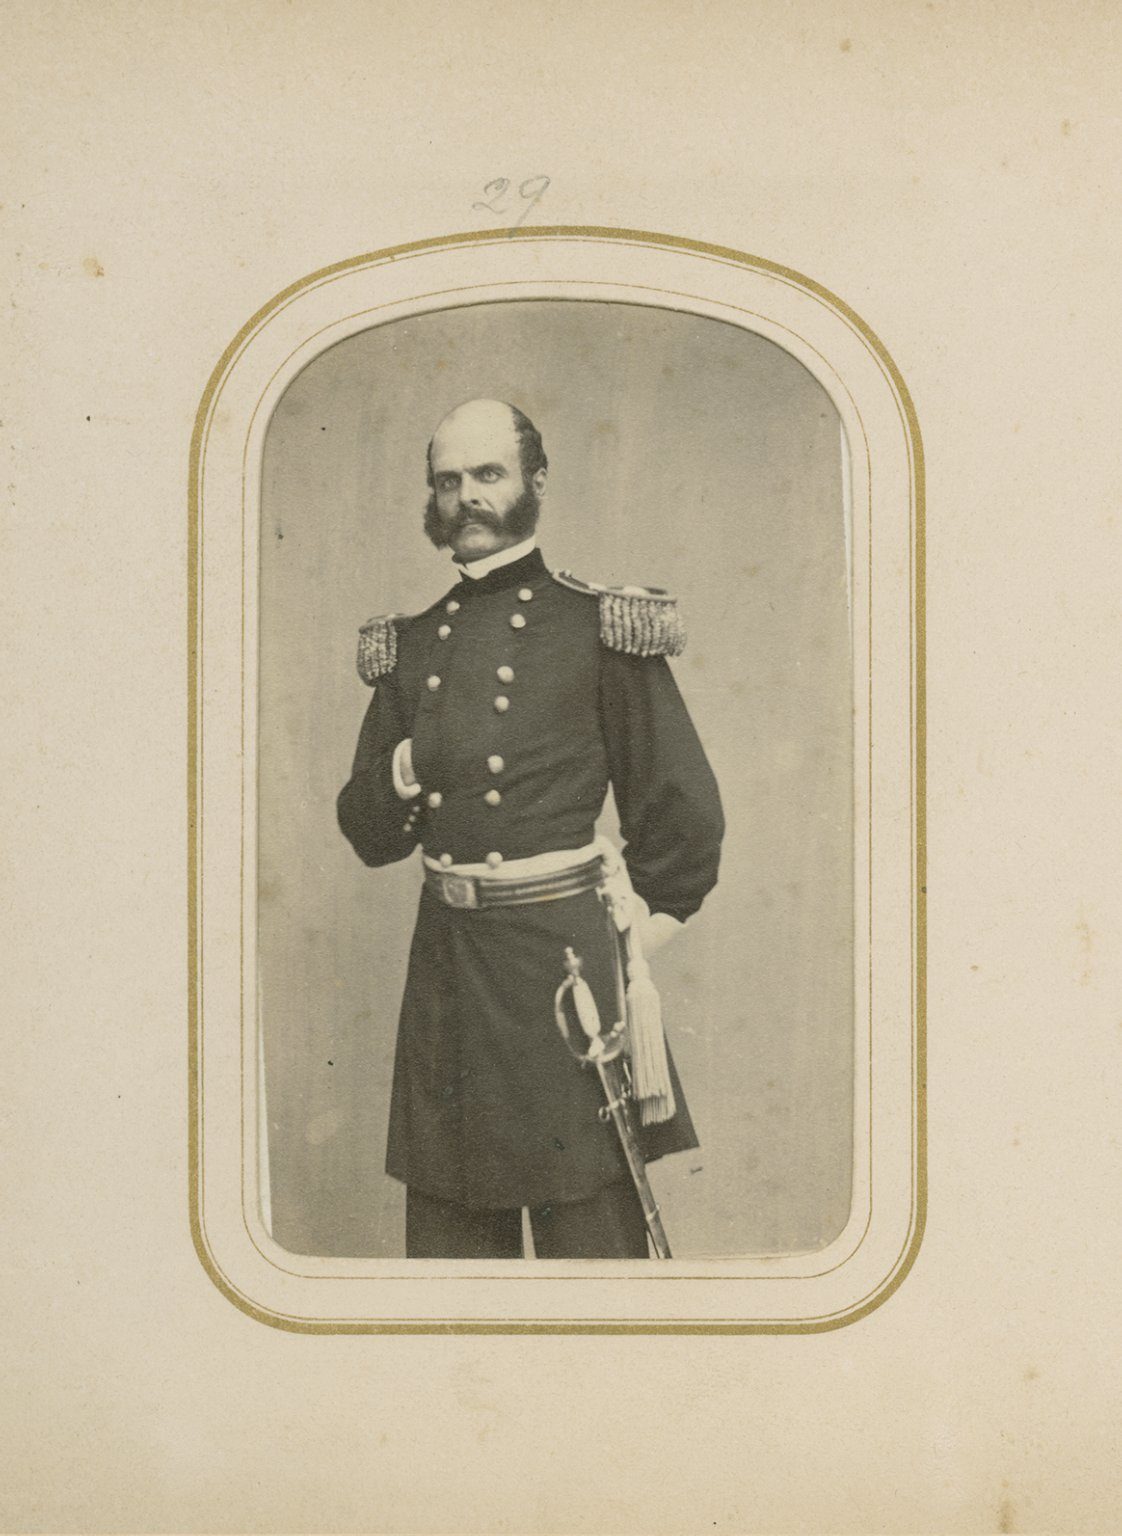 Gen. Ambrose Burnside